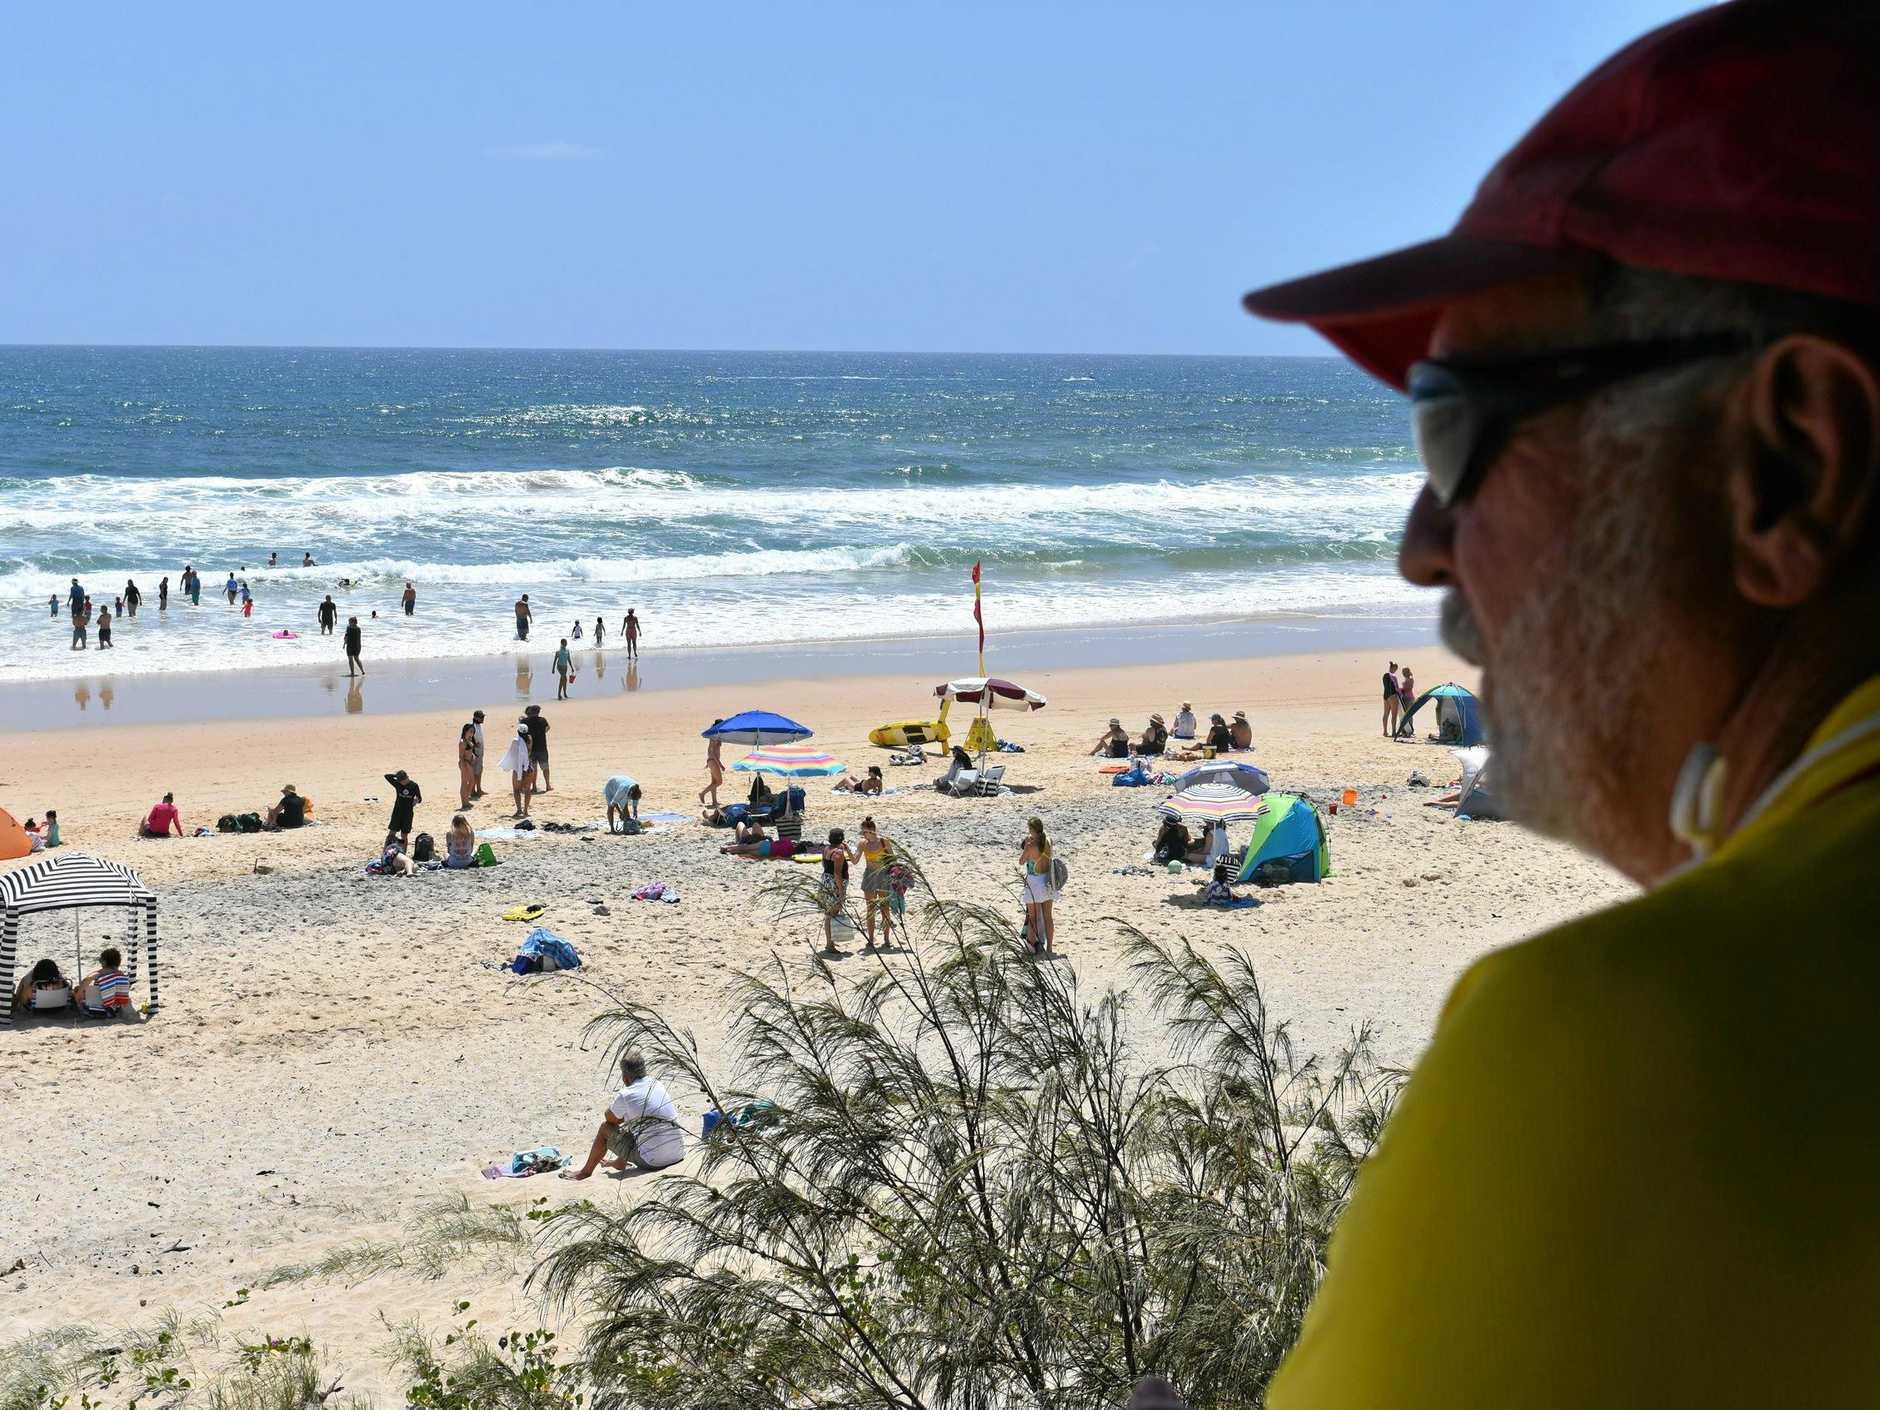 ON DUTY: Veteran Rainbow Beach lifeguard Ron Organ was keeping watch over a big crowd of bathers on Sunday.